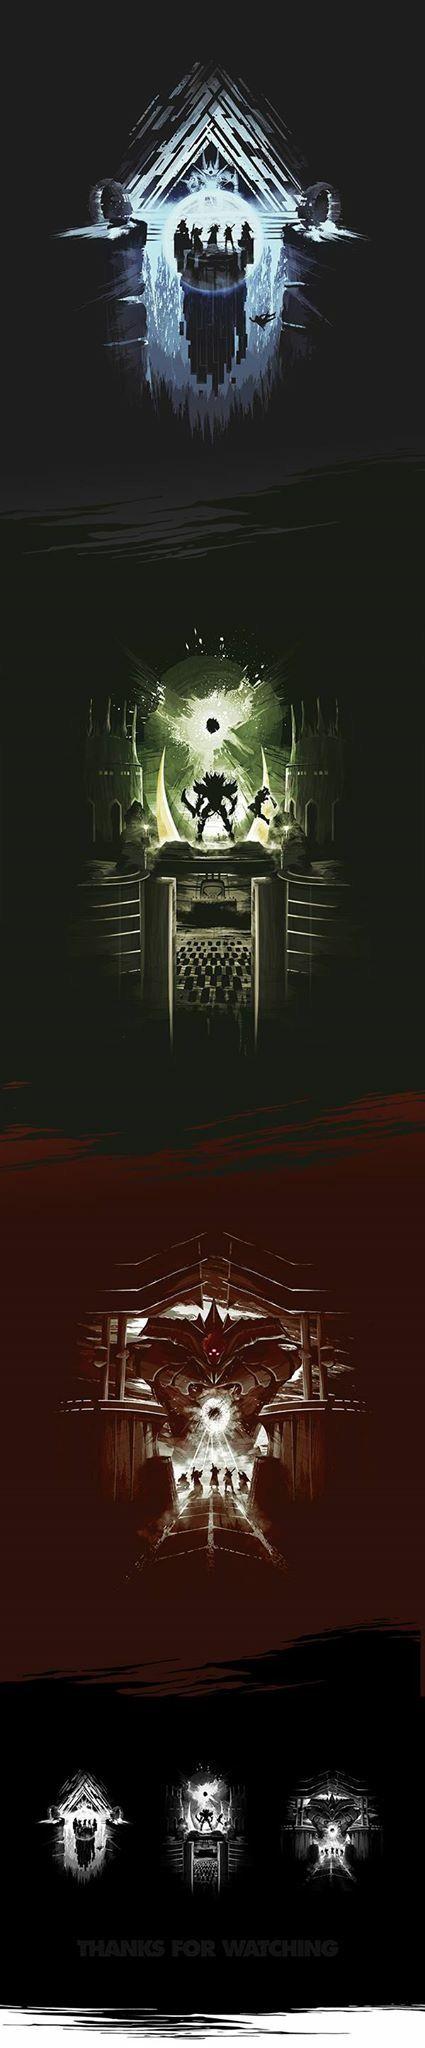 Destiny the game #TTK #VOG #COE